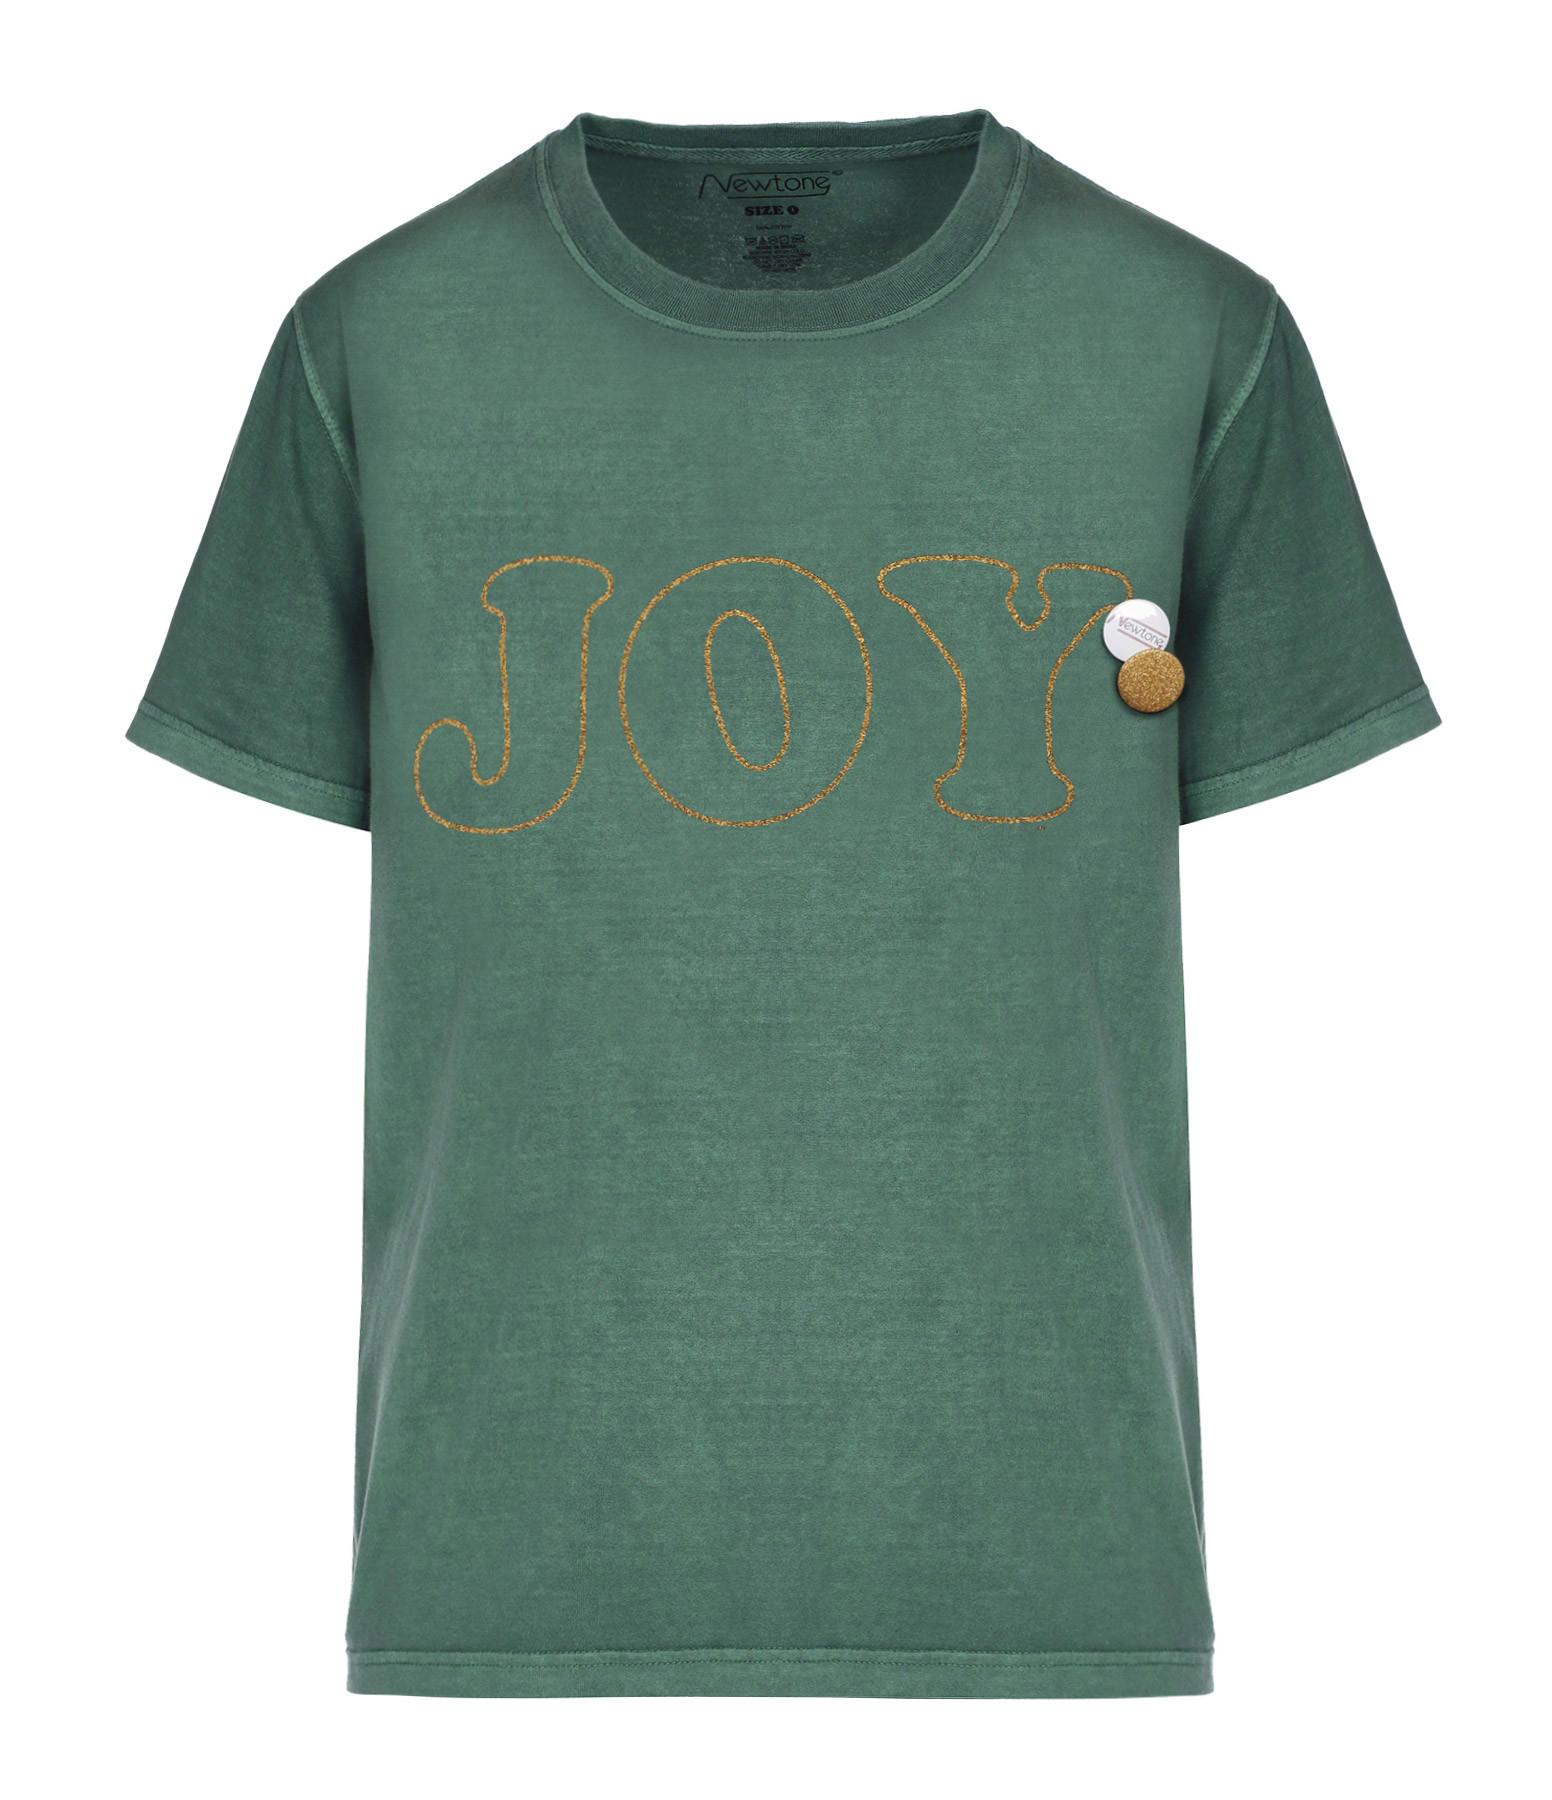 NEWTONE - Tee-shirt Joy Coton Forêt